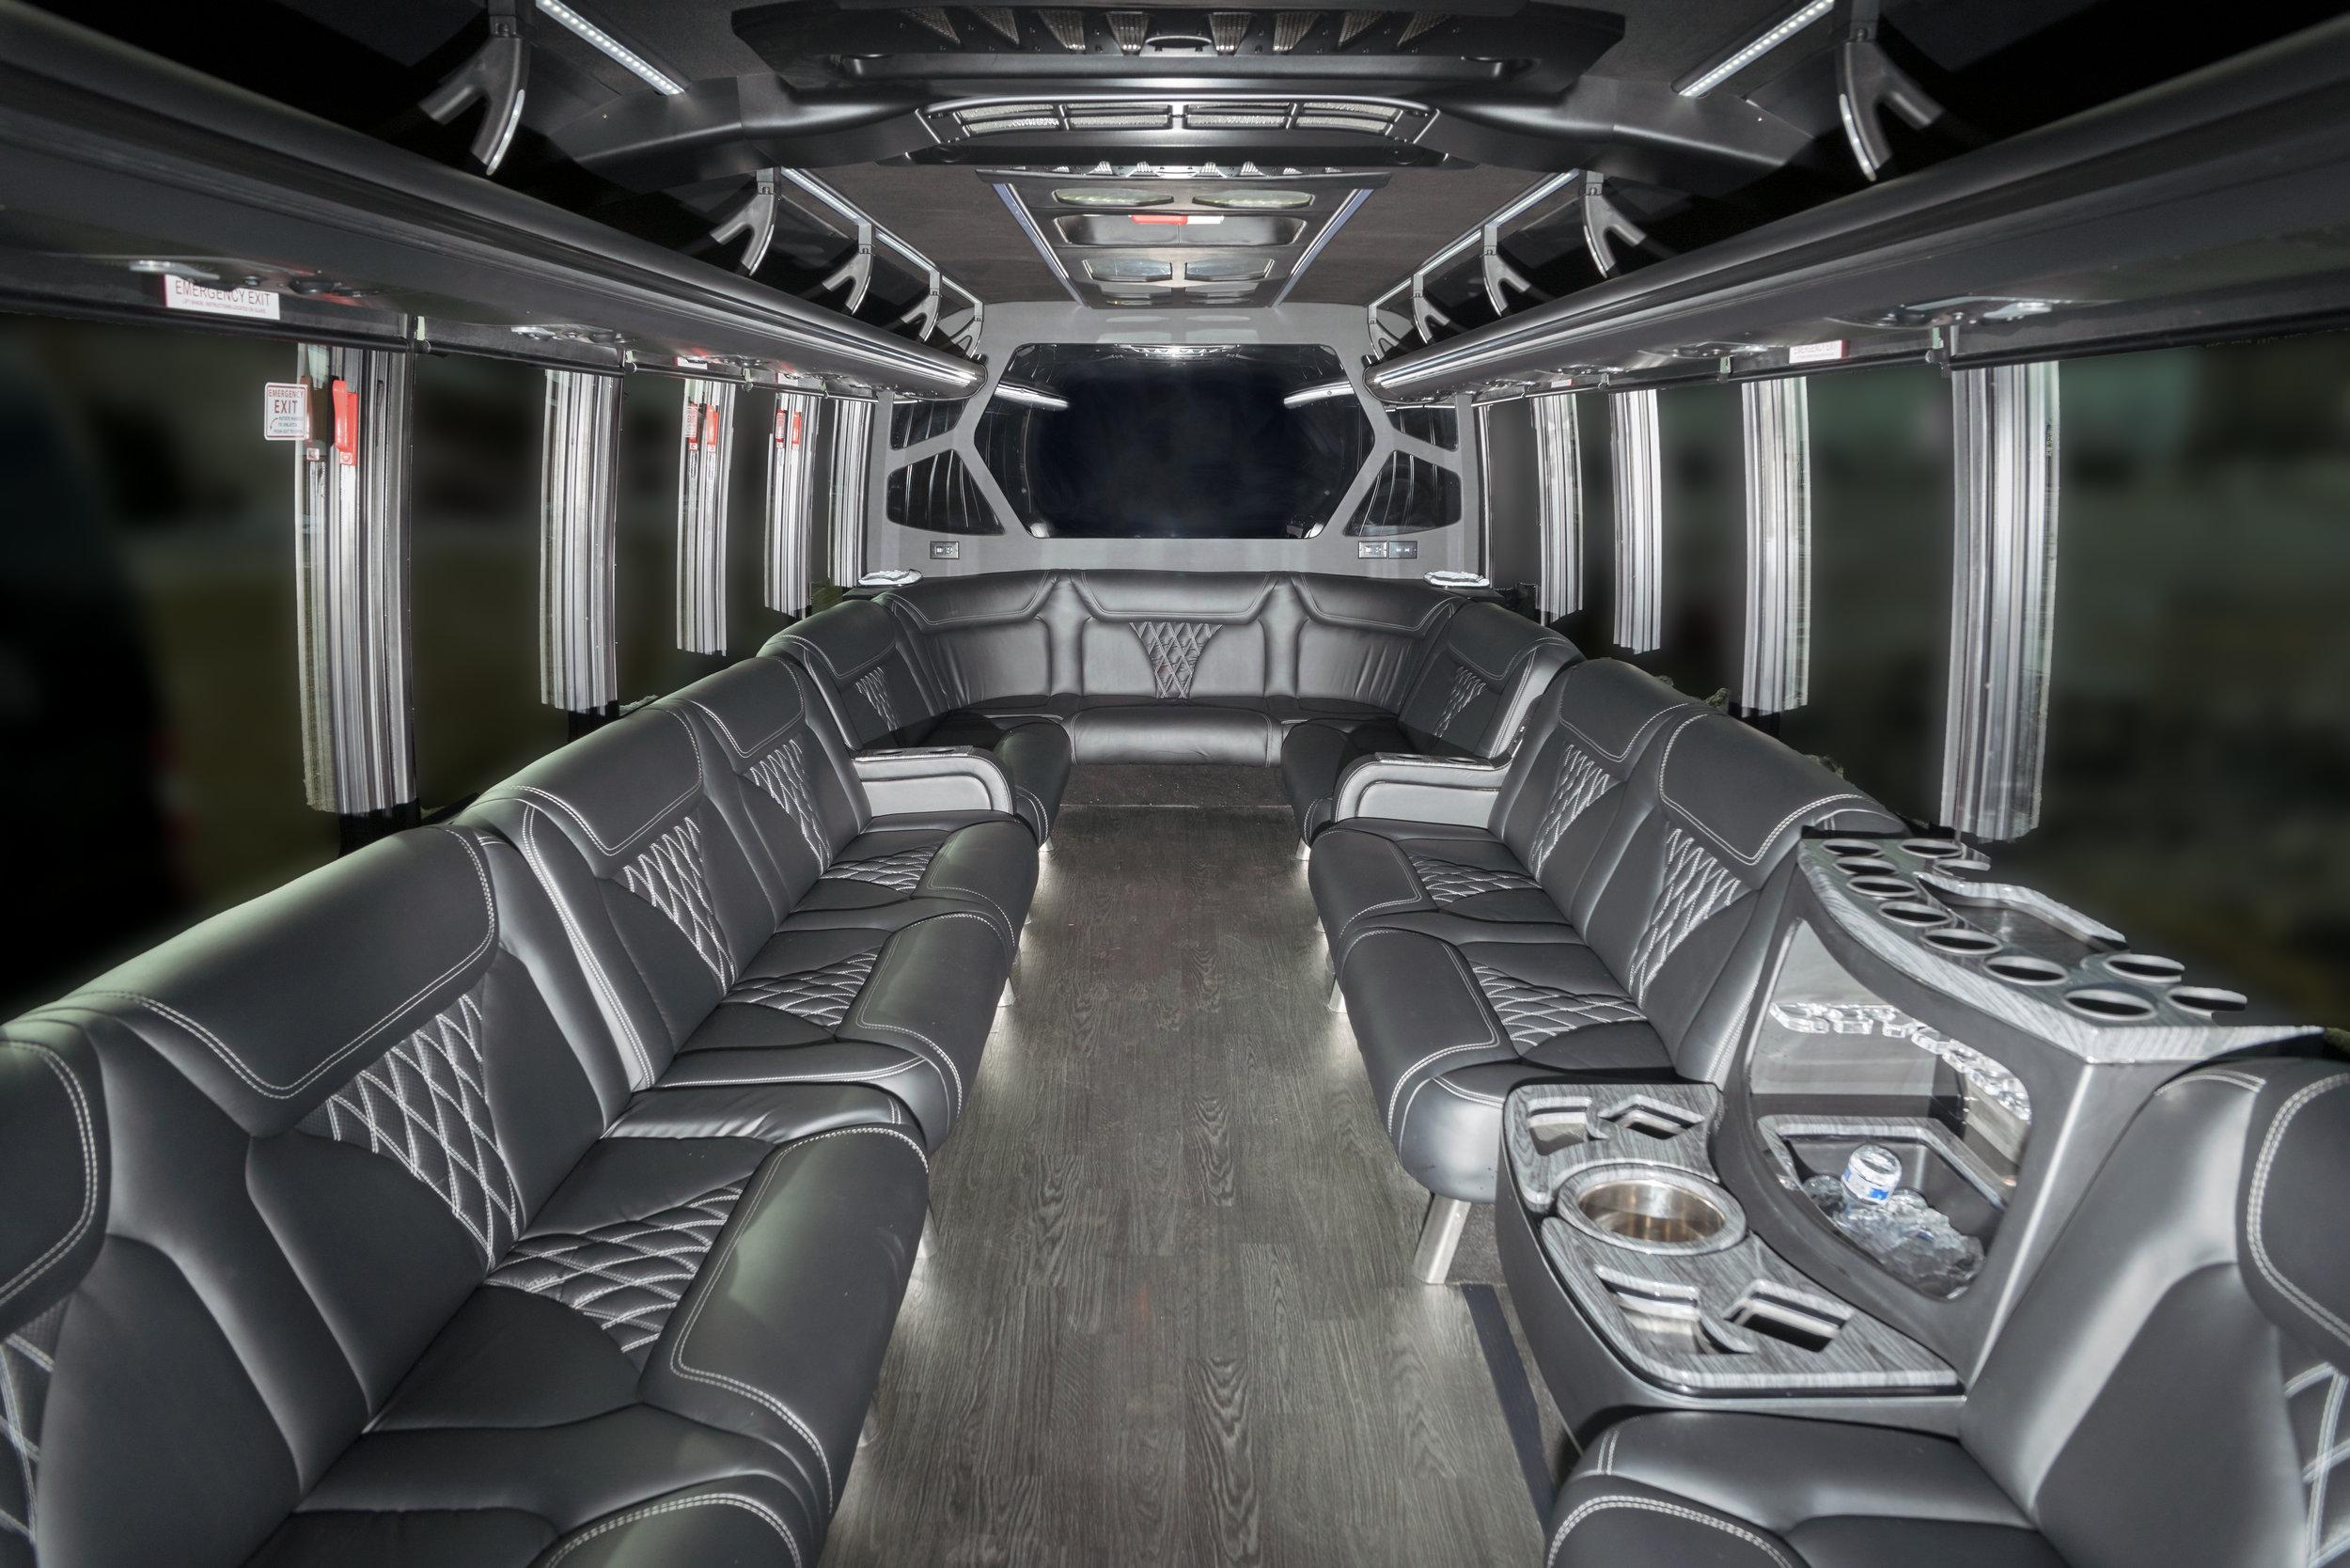 Top Notch Party Bus 2 Interior_1.jpg